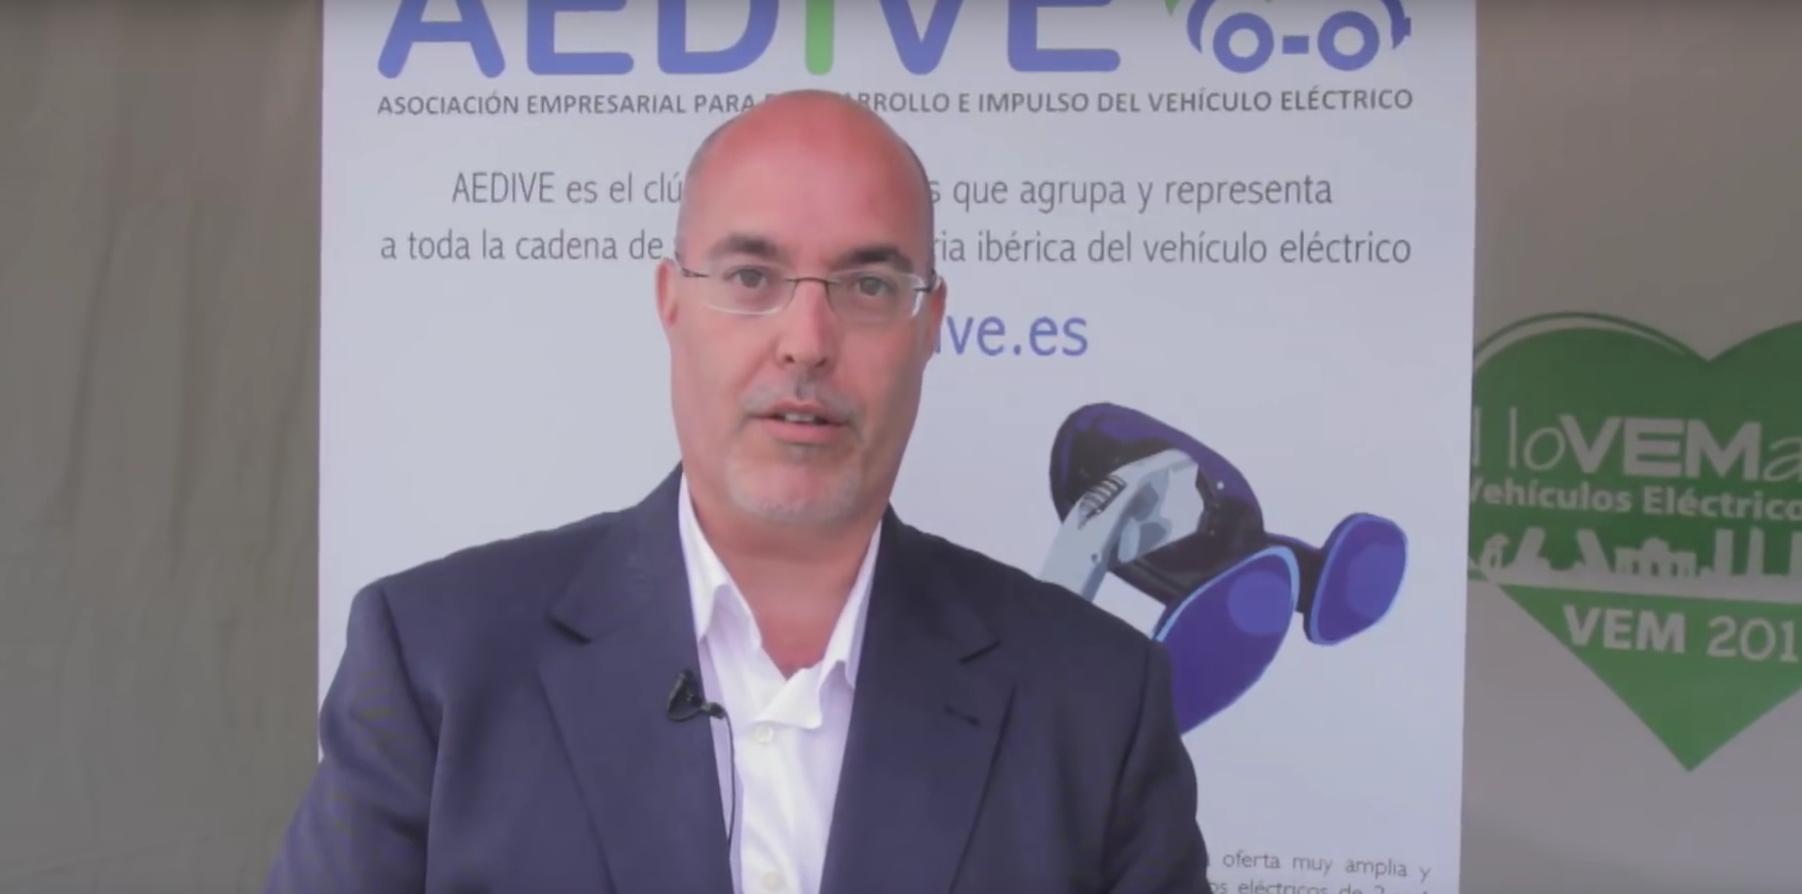 Arturo Pérez de Lucia, director gerente de AEDIVE